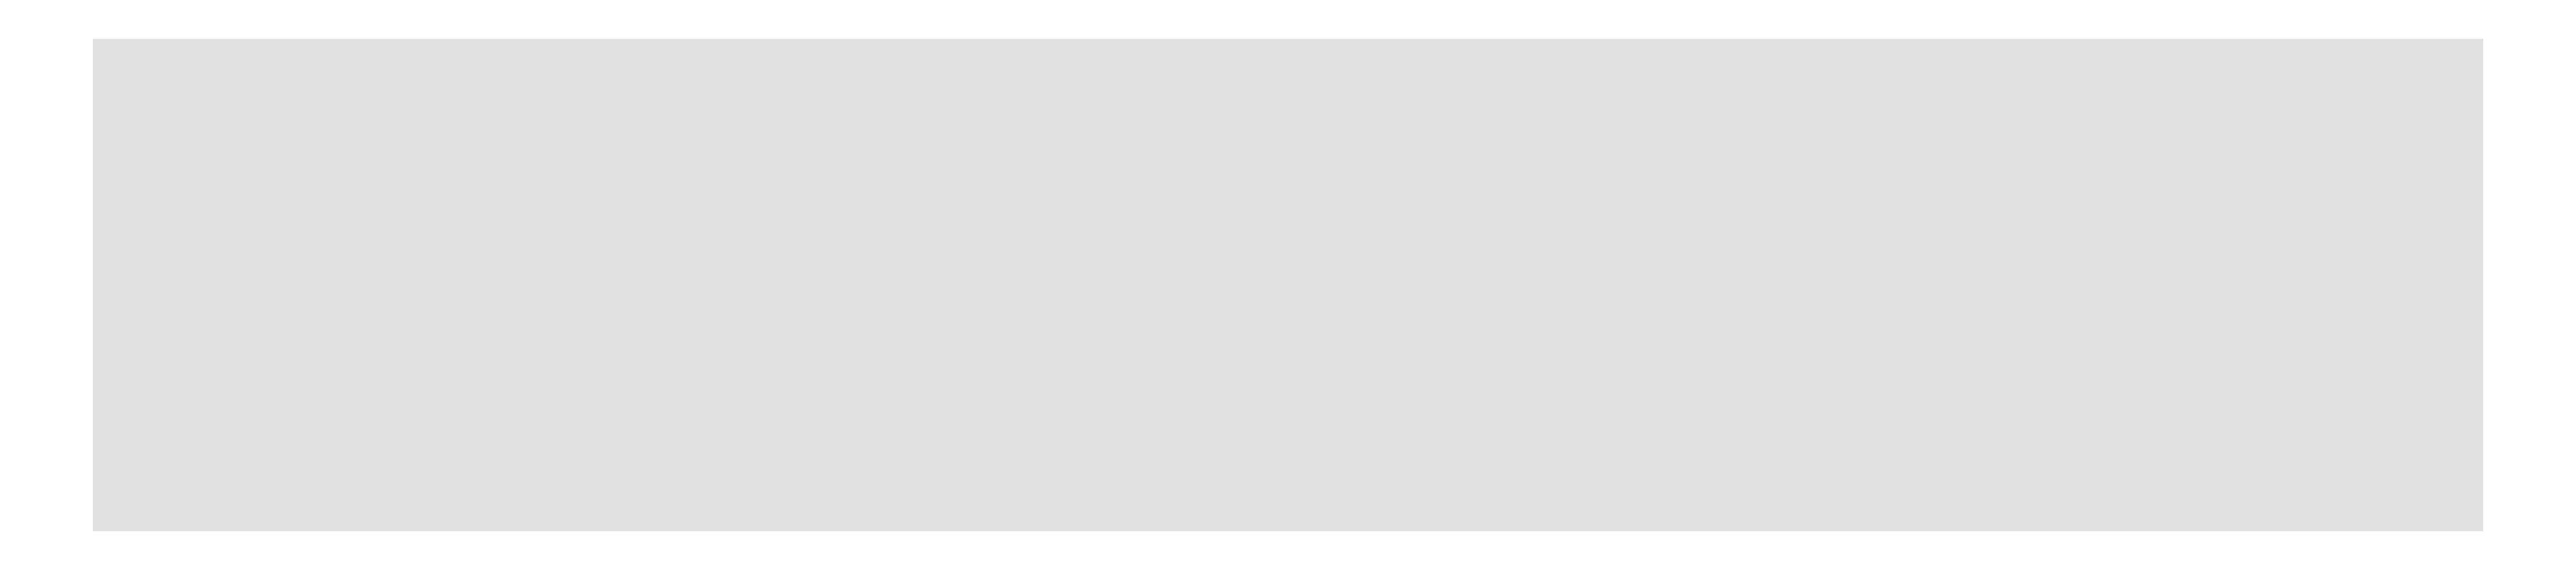 Soundbyte Studios